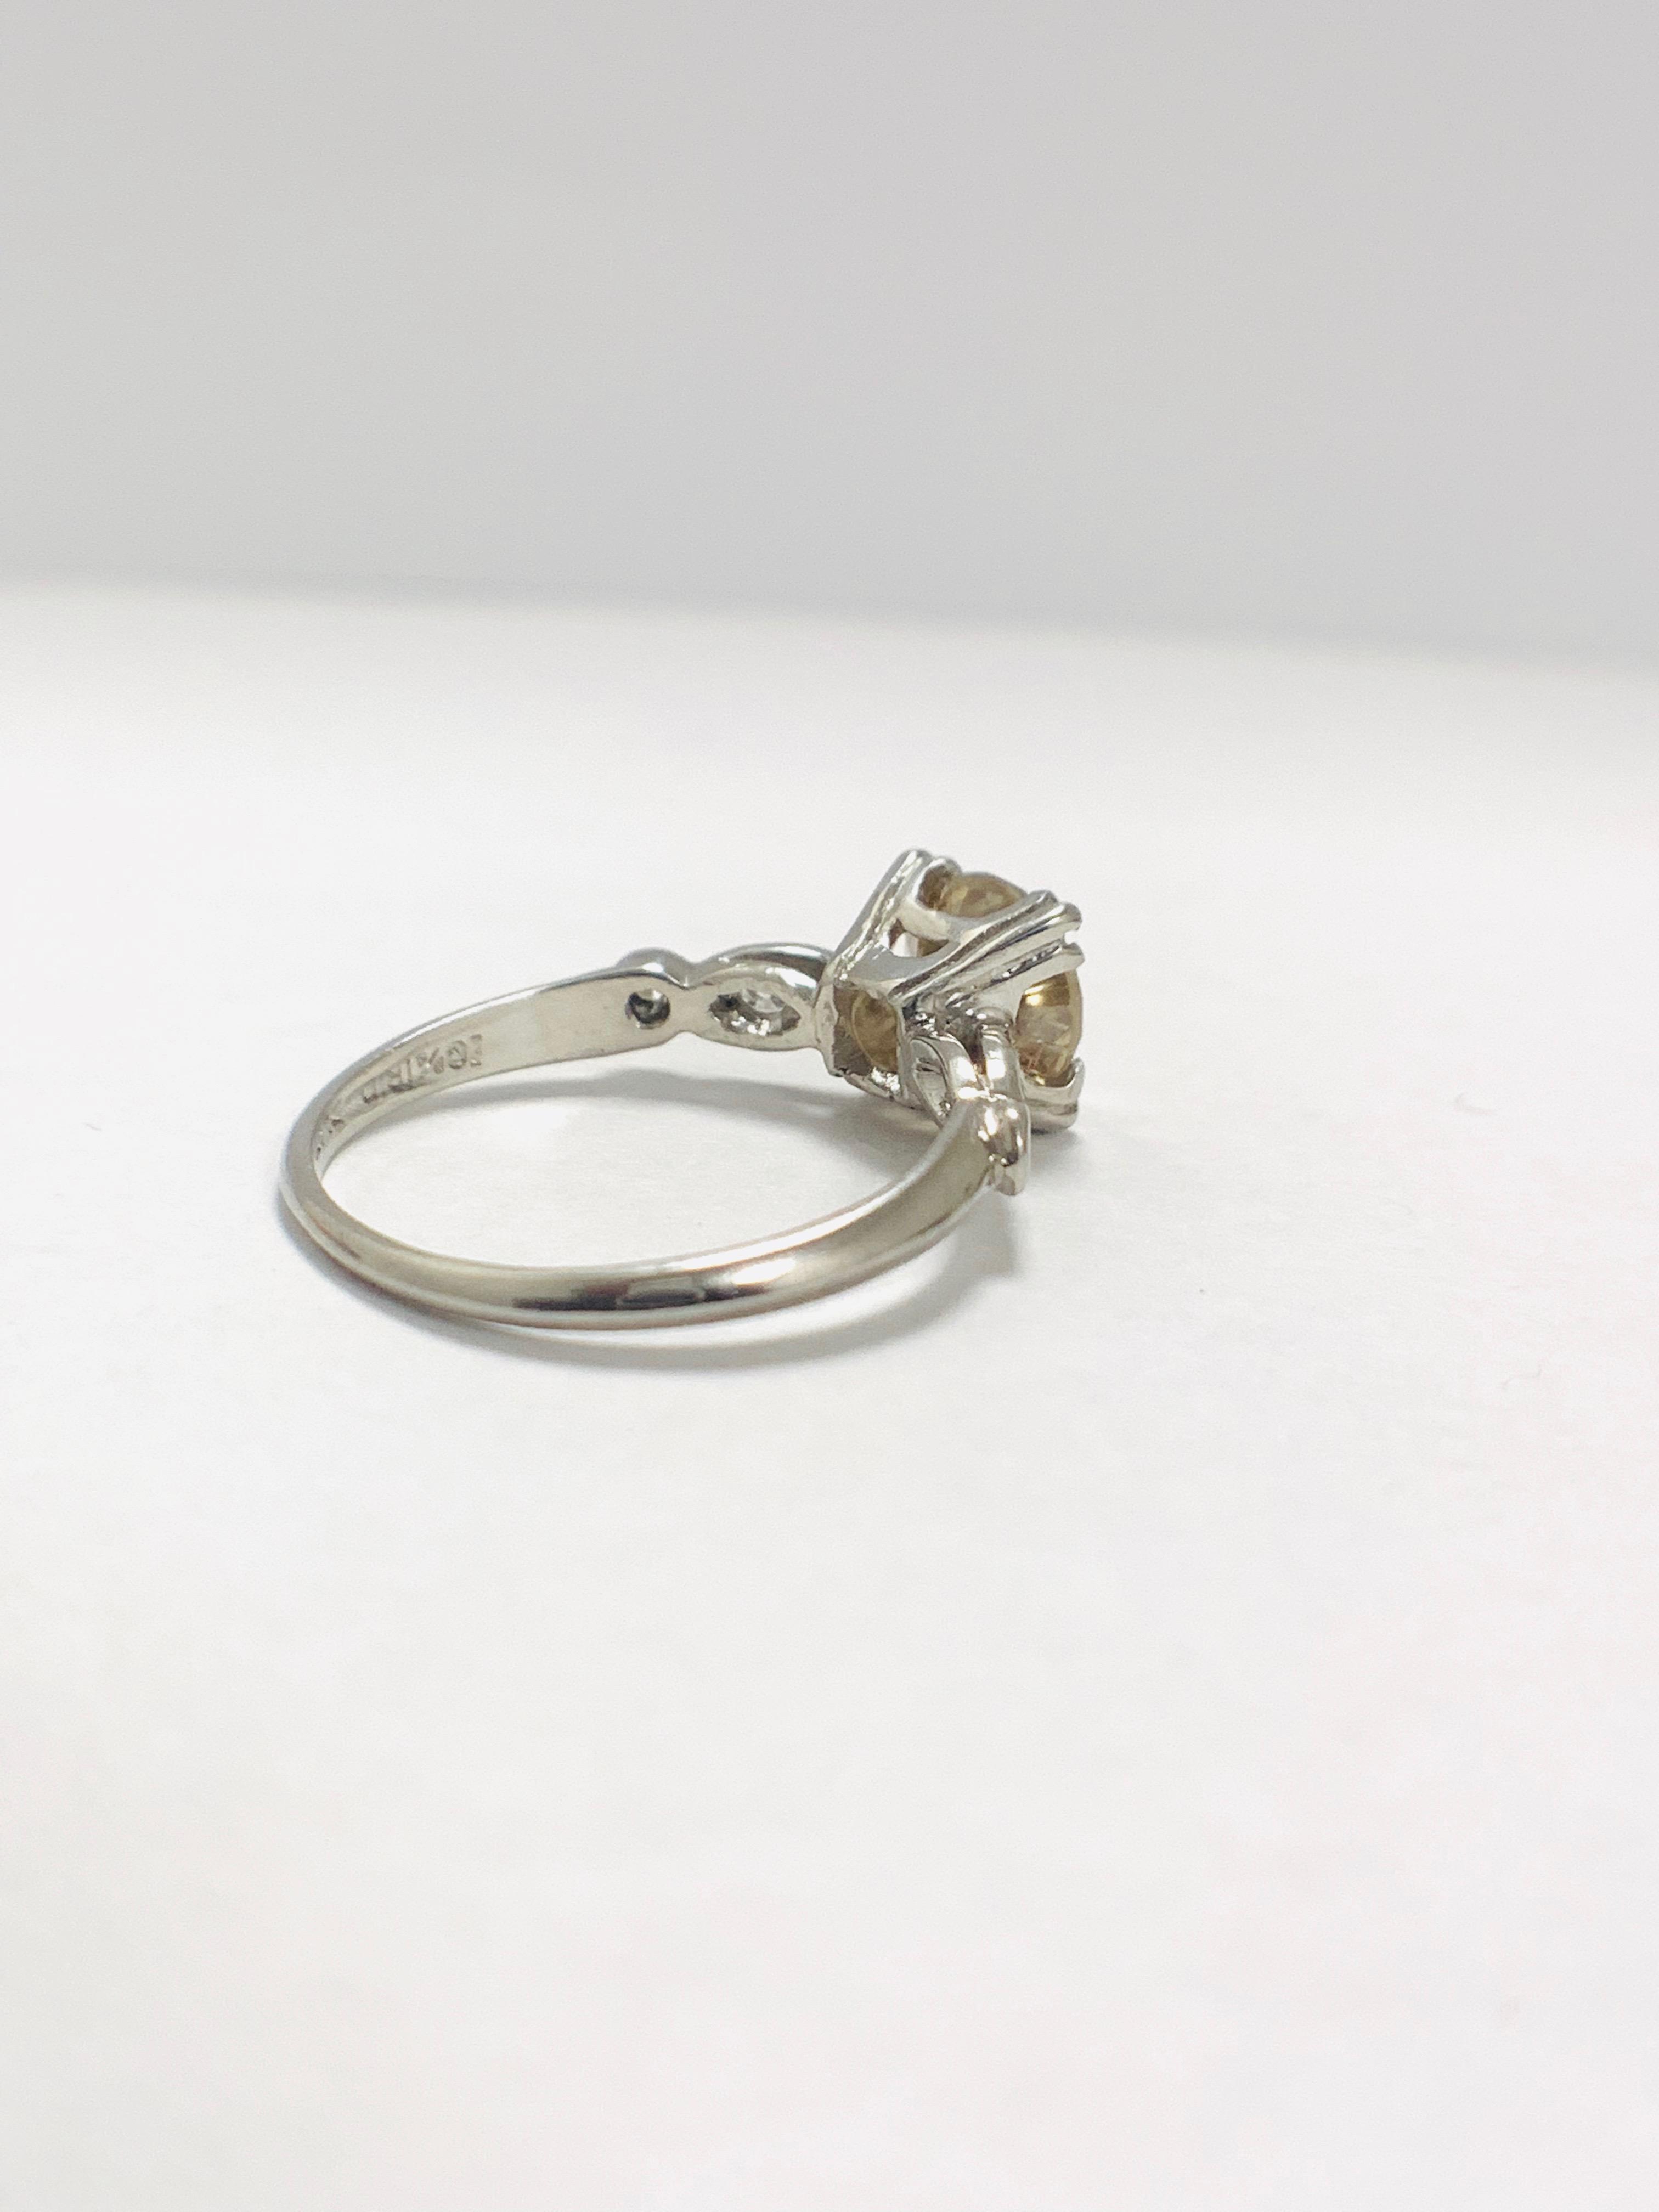 Platinum Diamond ring featuring centre, round brilliant cut, fancy light brown Diamond (1.55ct) - Image 5 of 14